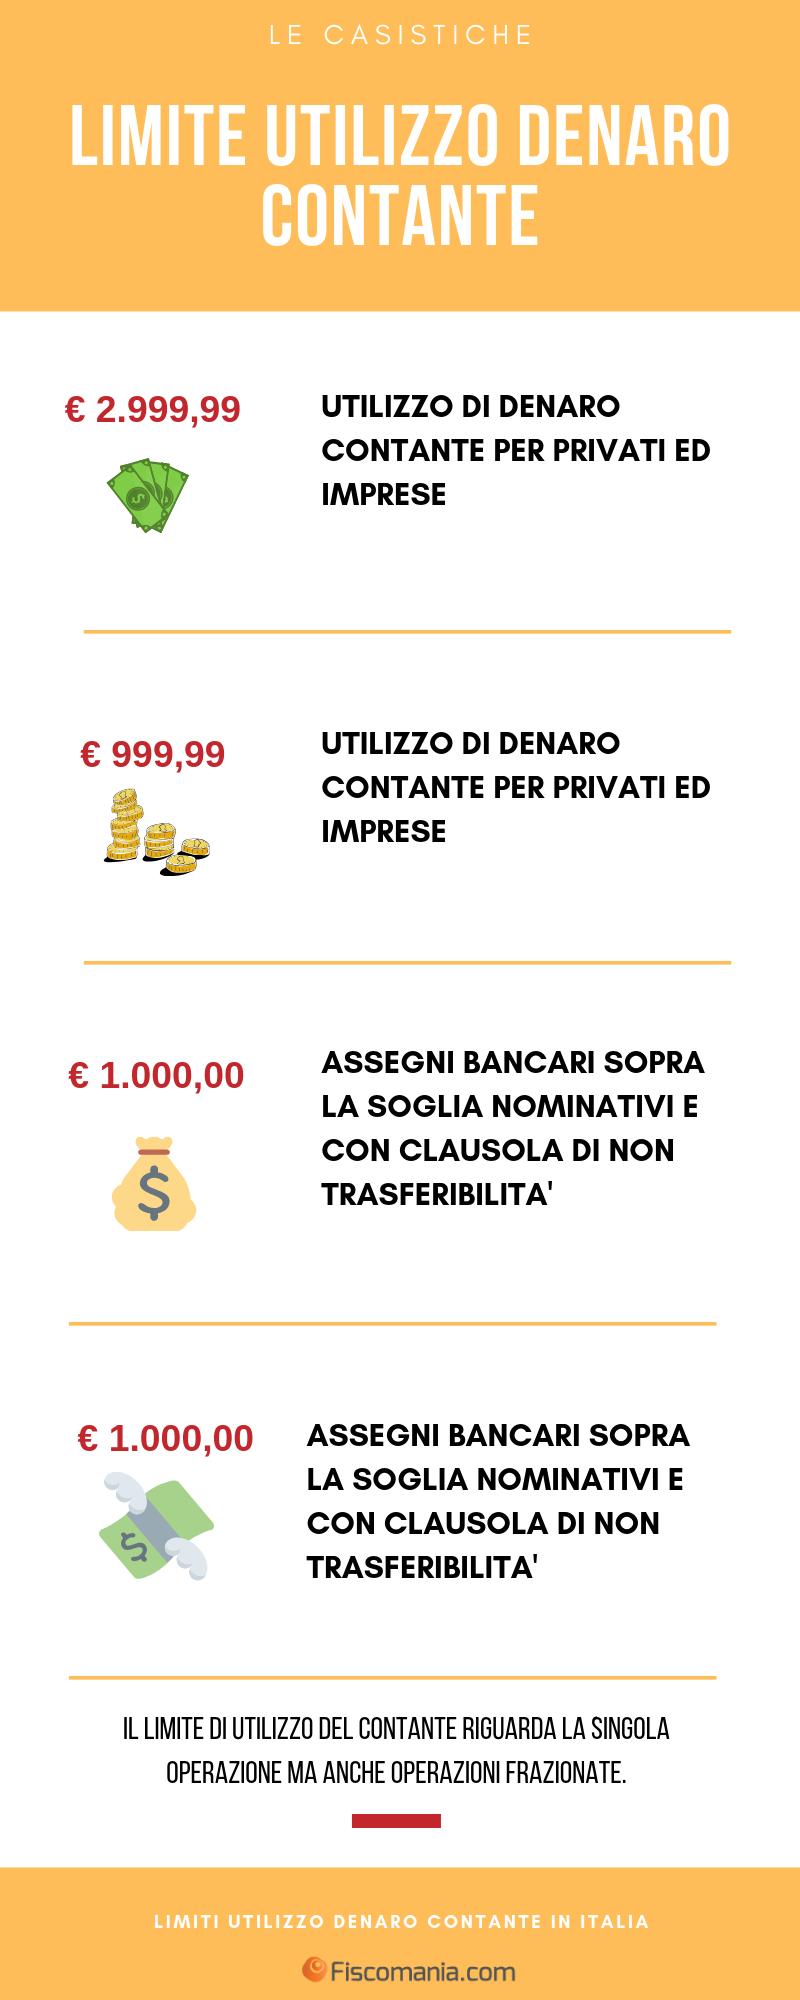 Limite utilizzo denaro contante